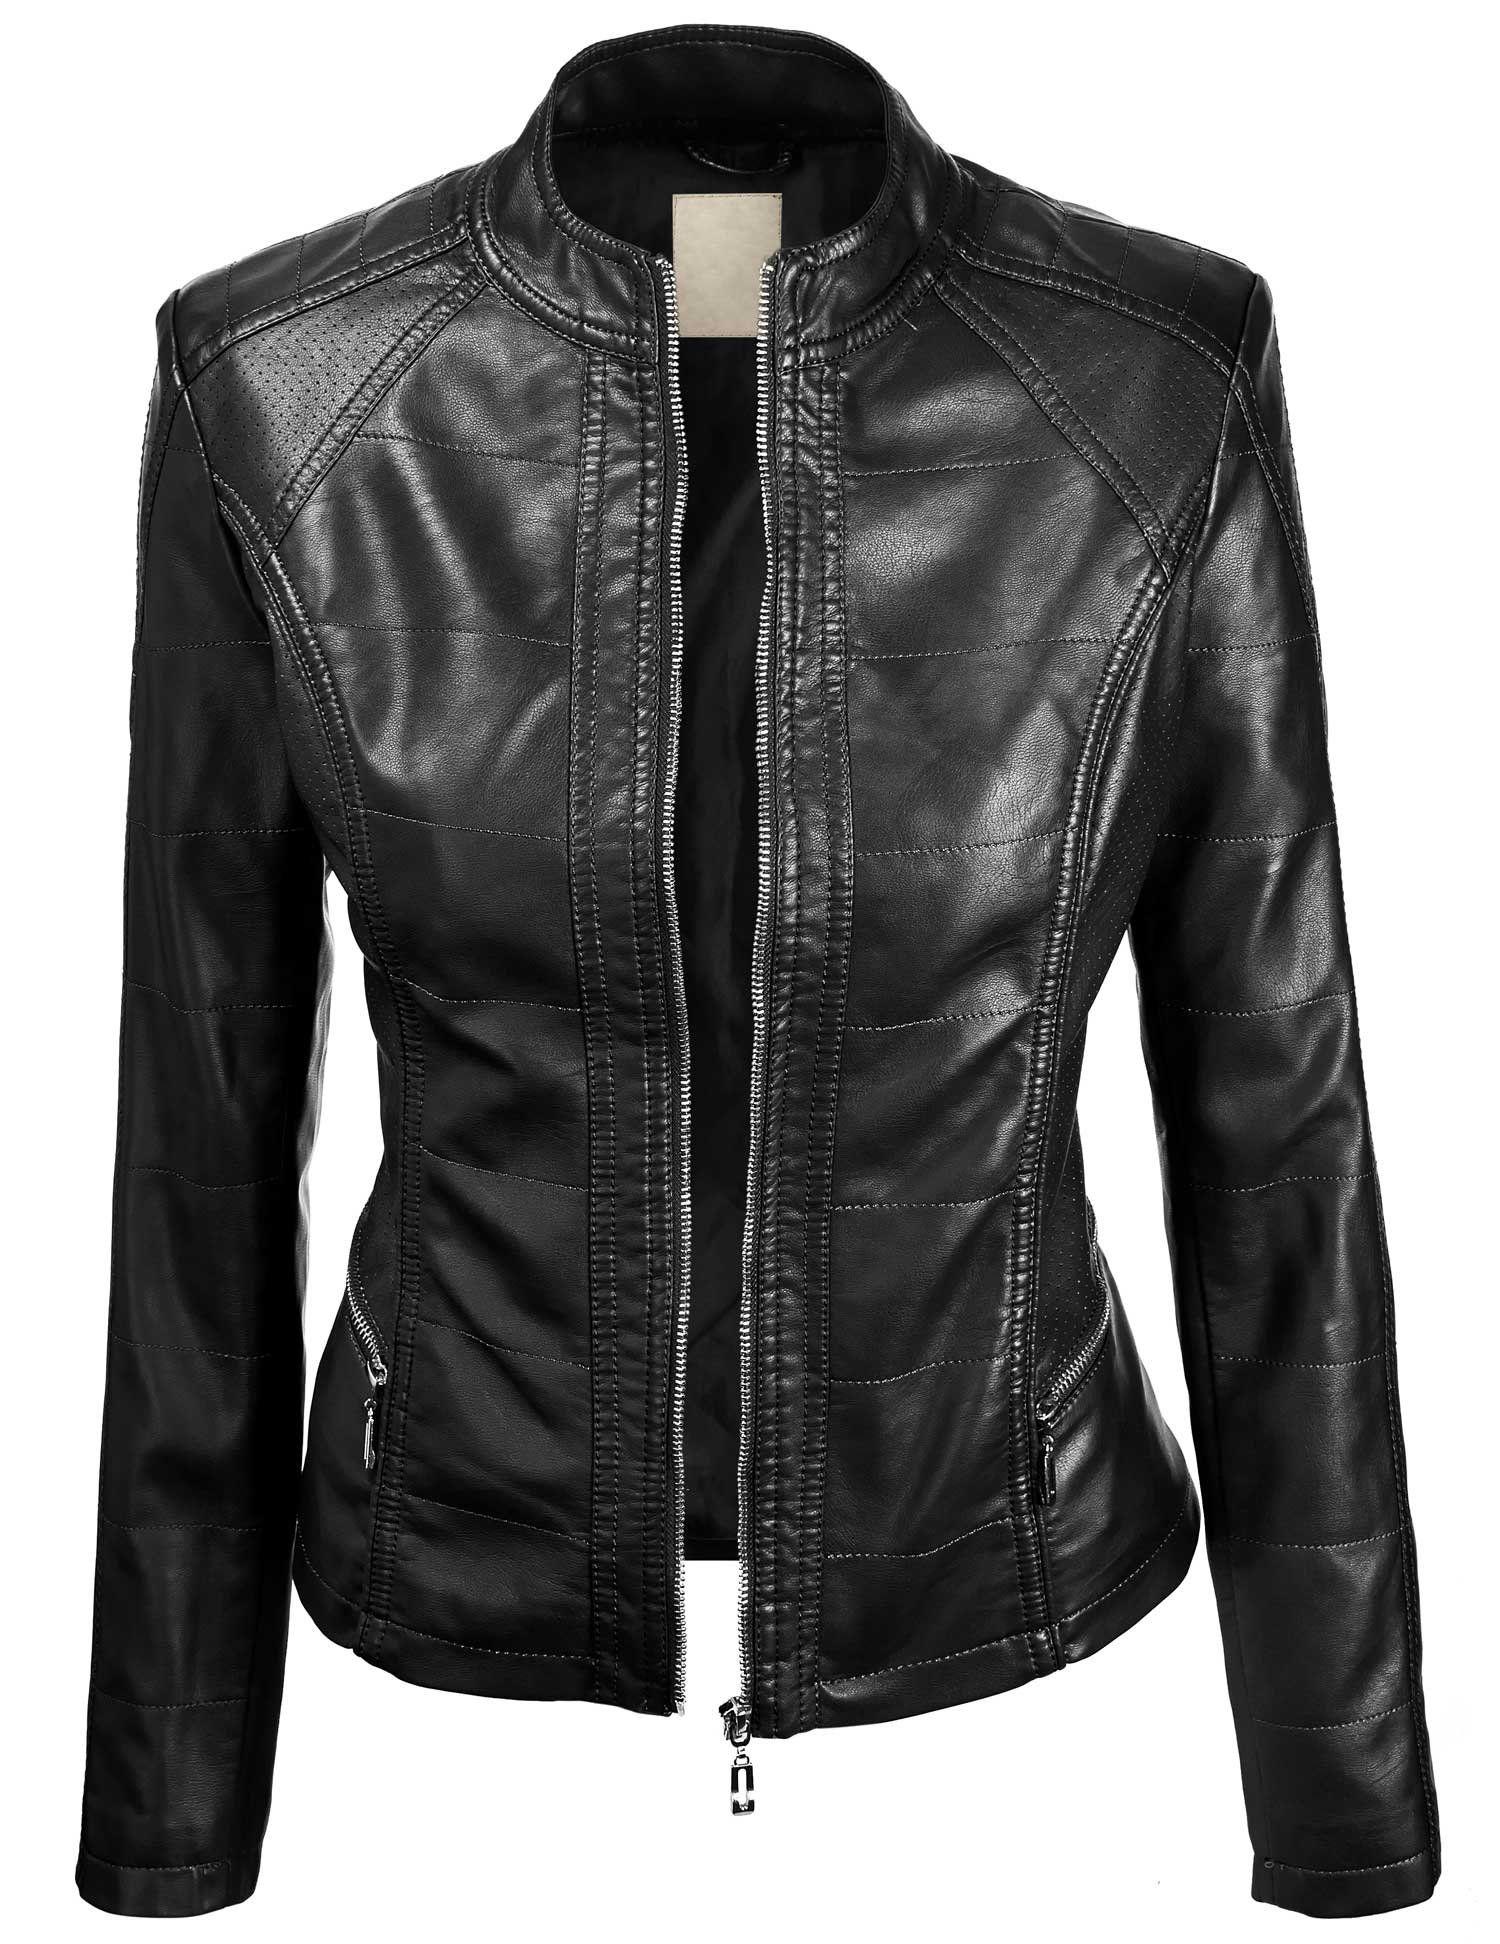 Ll Womens Everyday Bomber Jacket At Amazon Women S Coats Shop Faux Leather Jacket Women Leather Look Jackets Leather Jackets Women